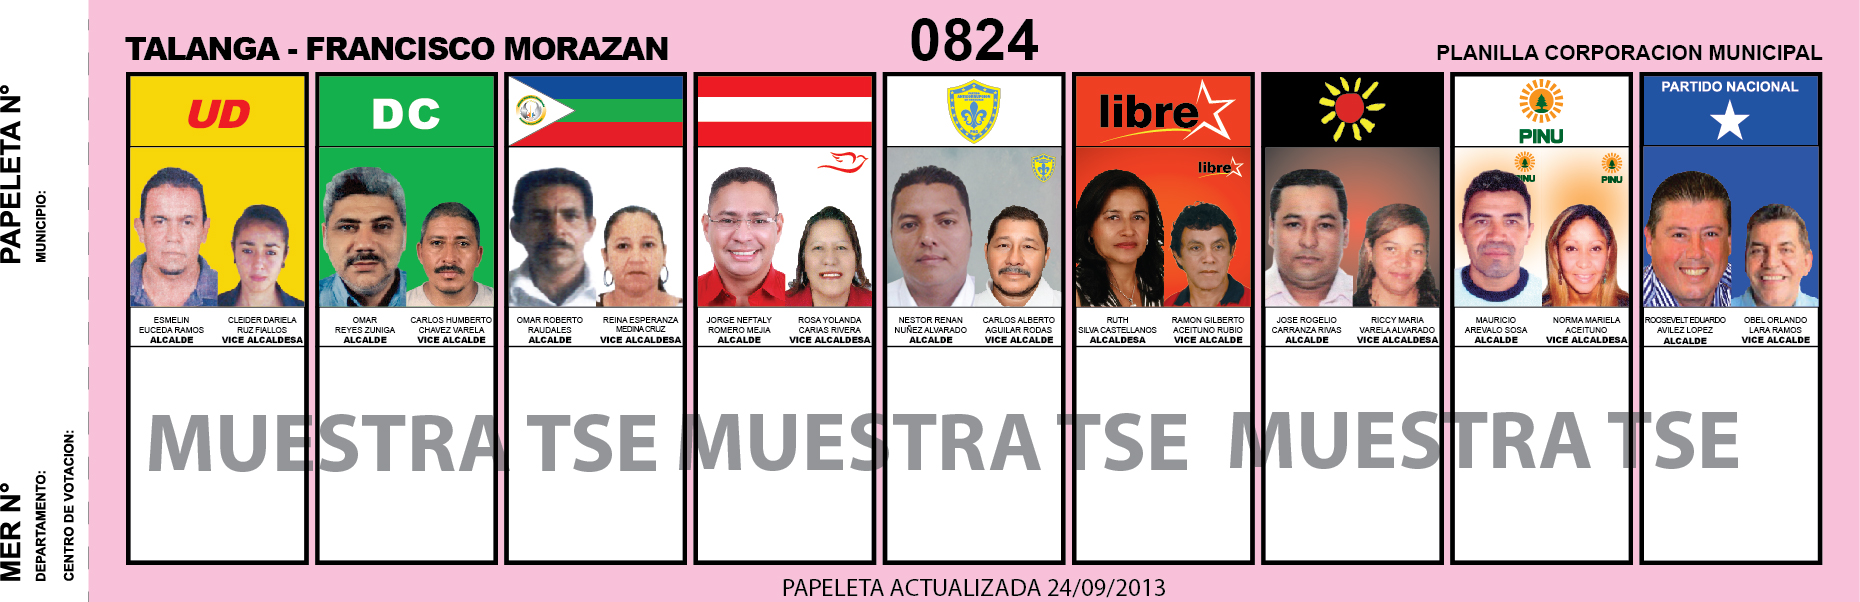 CANDIDATOS 2013 MUNICIPIO TALANGA - FRANCISCO MORAZAN - HONDURAS